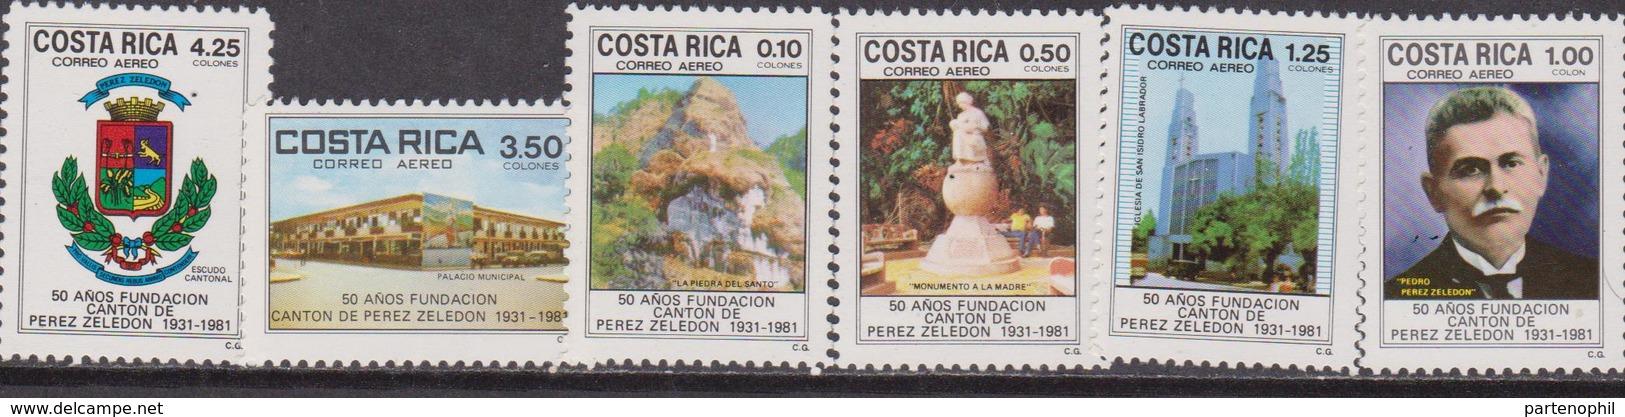 Costa Rica 1981 50 Ann. Fundacion Set Mnh - Costa Rica